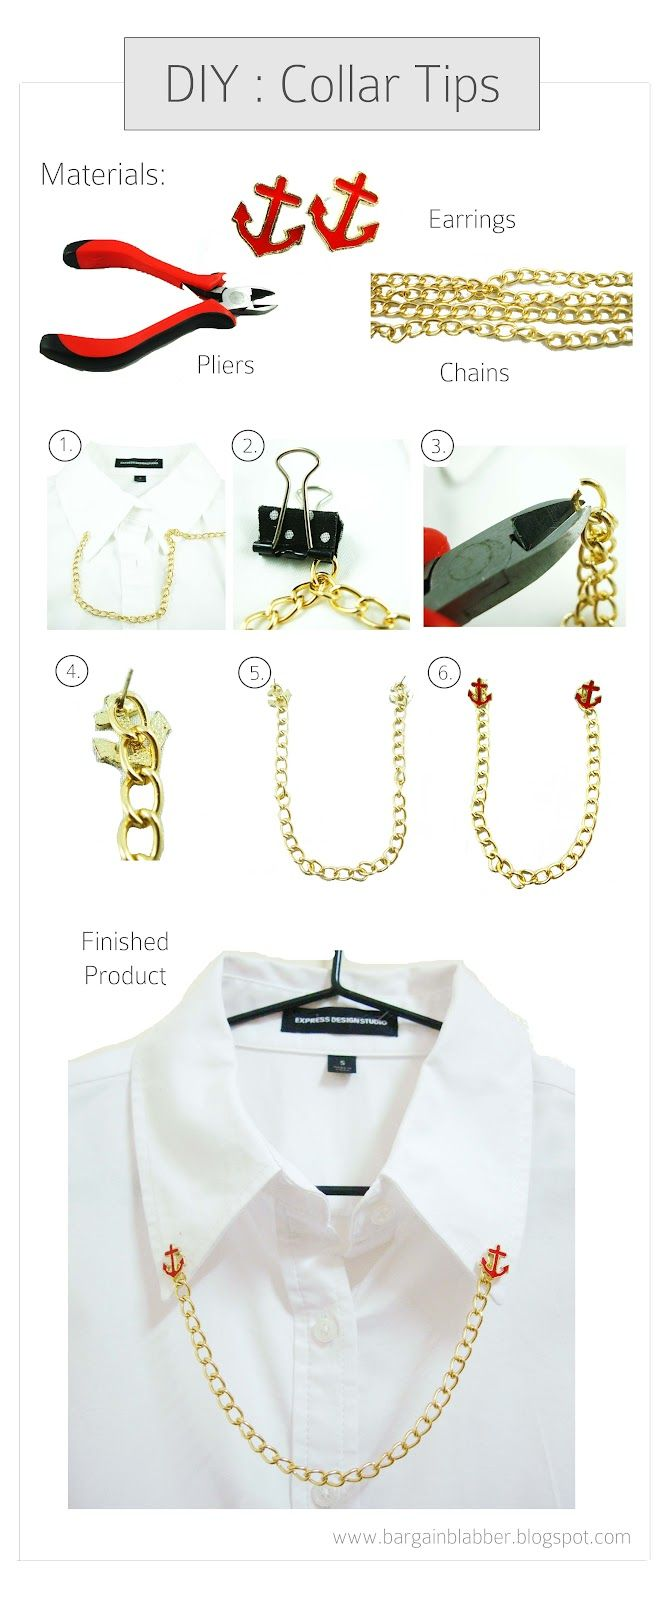 DIY: Collar Tips !